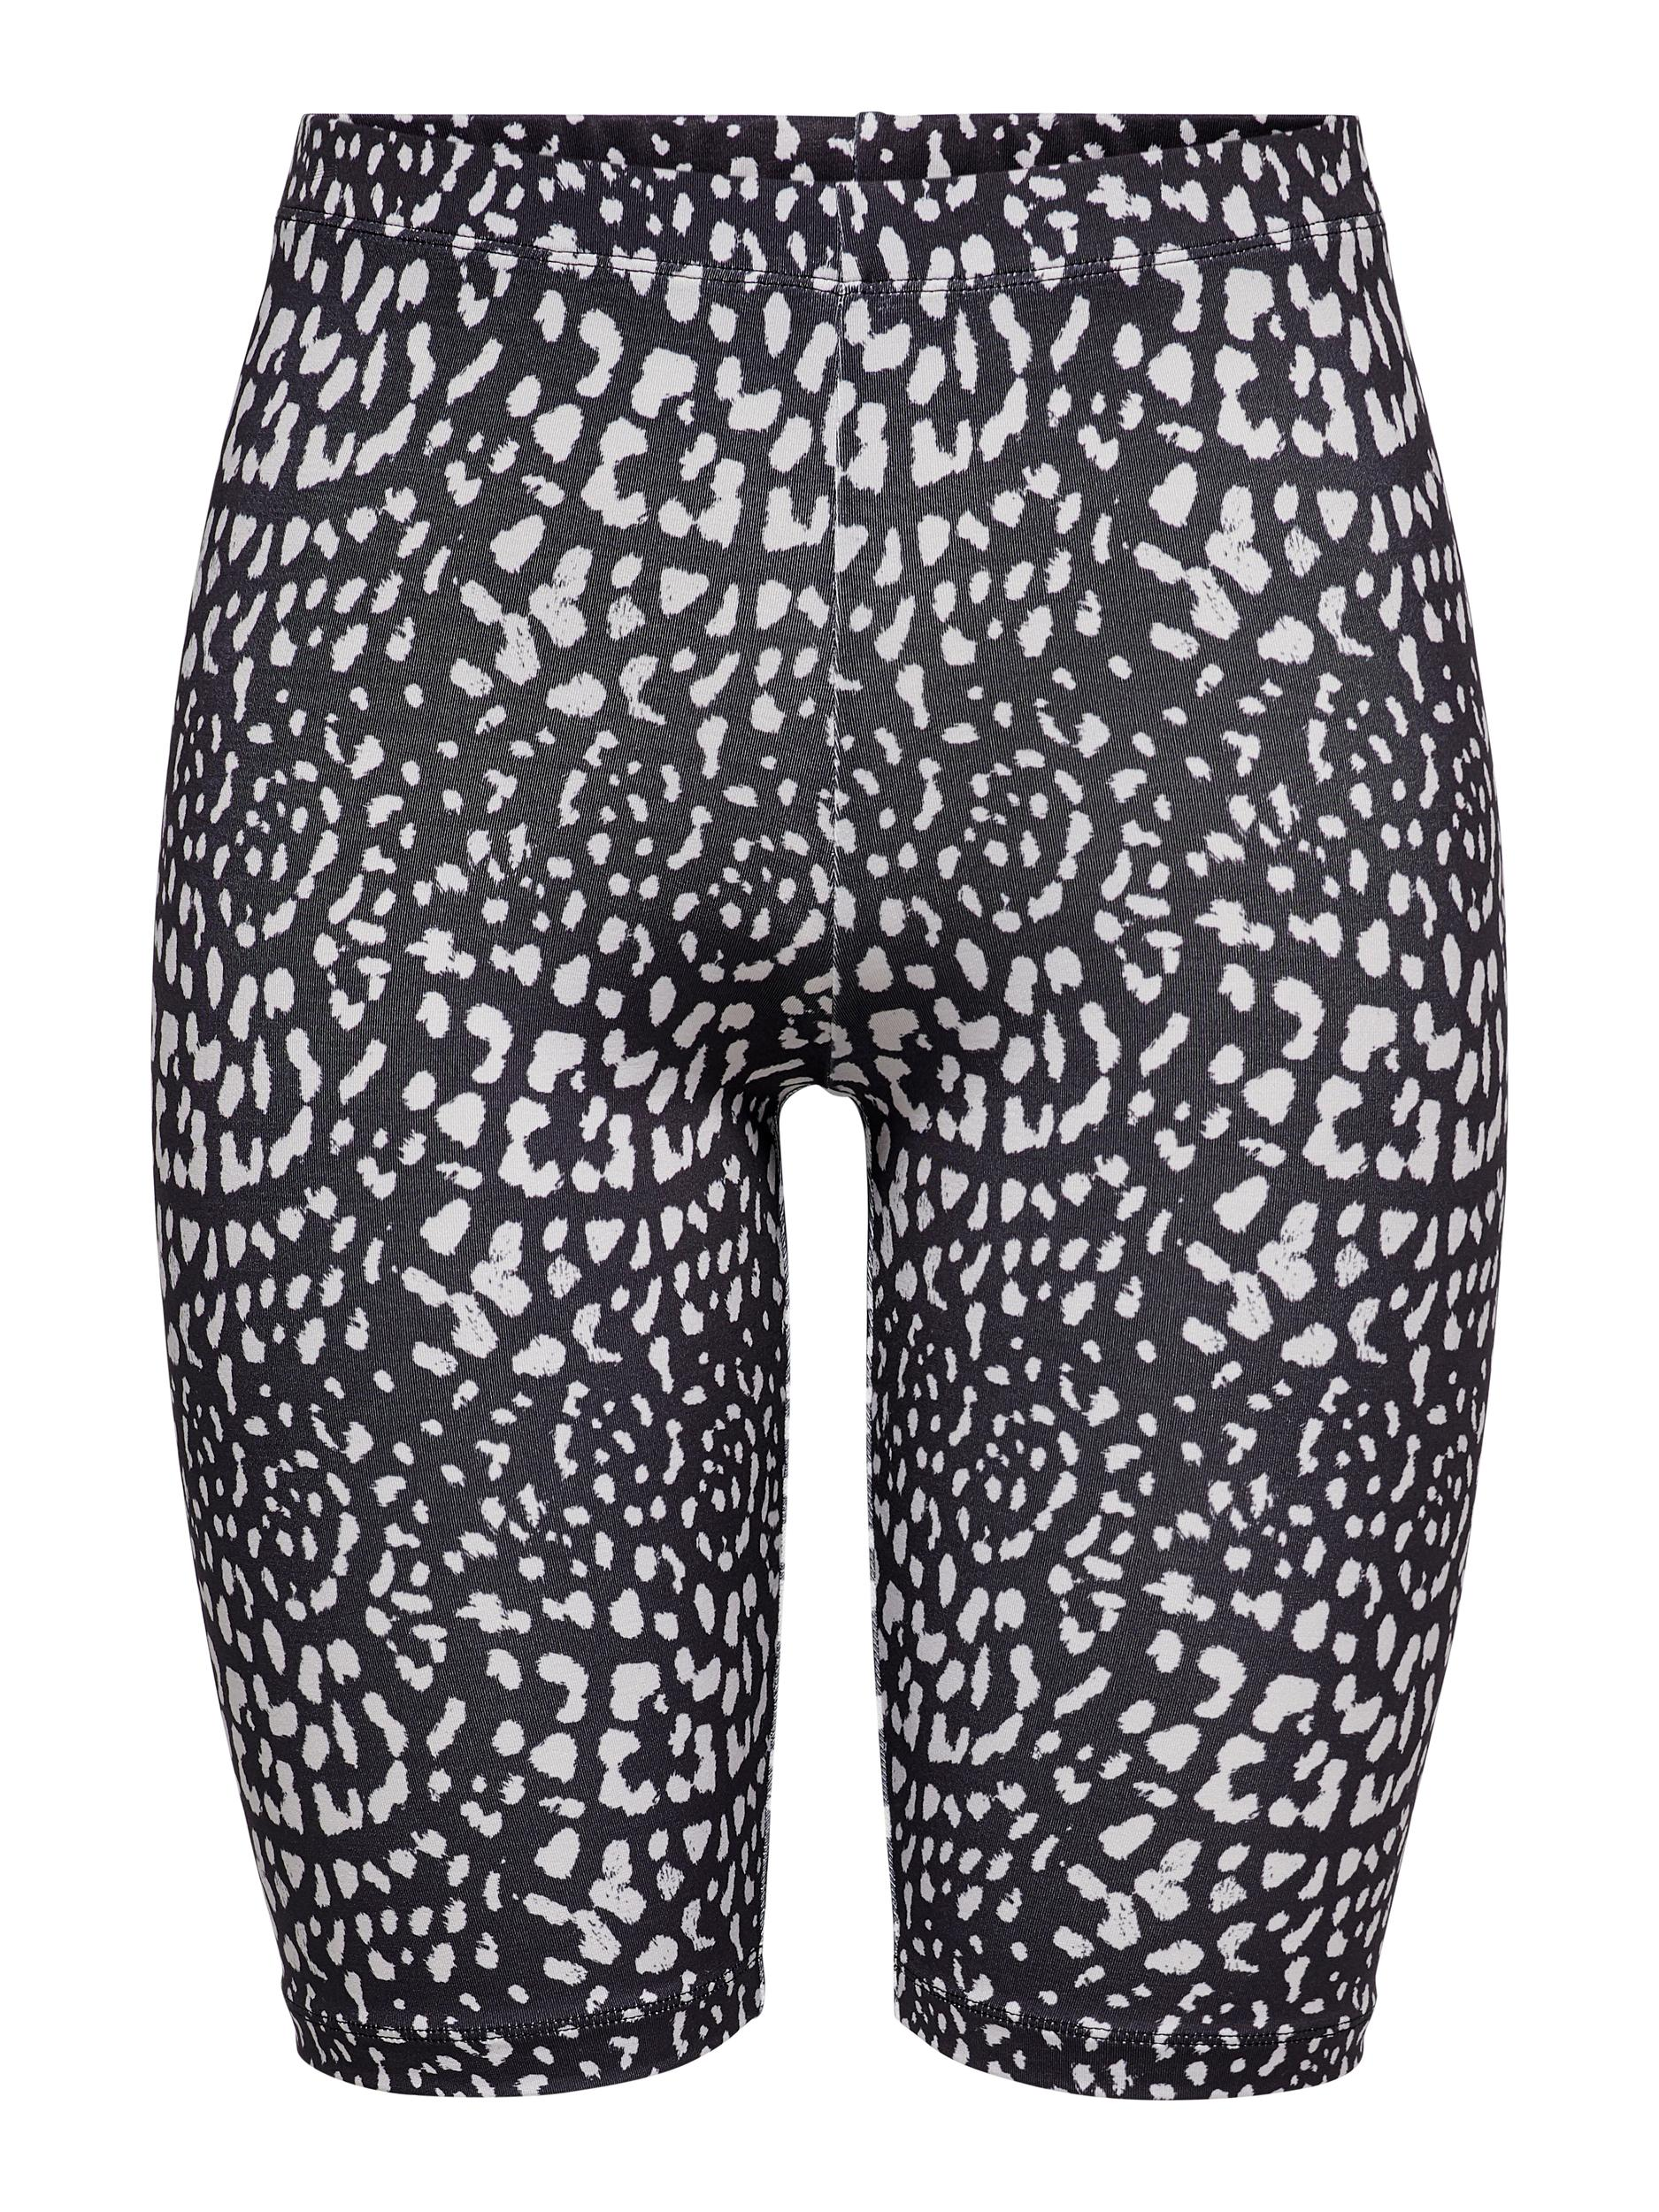 Jacqueline de Yong Rossy biker shorts, black/leo, medium